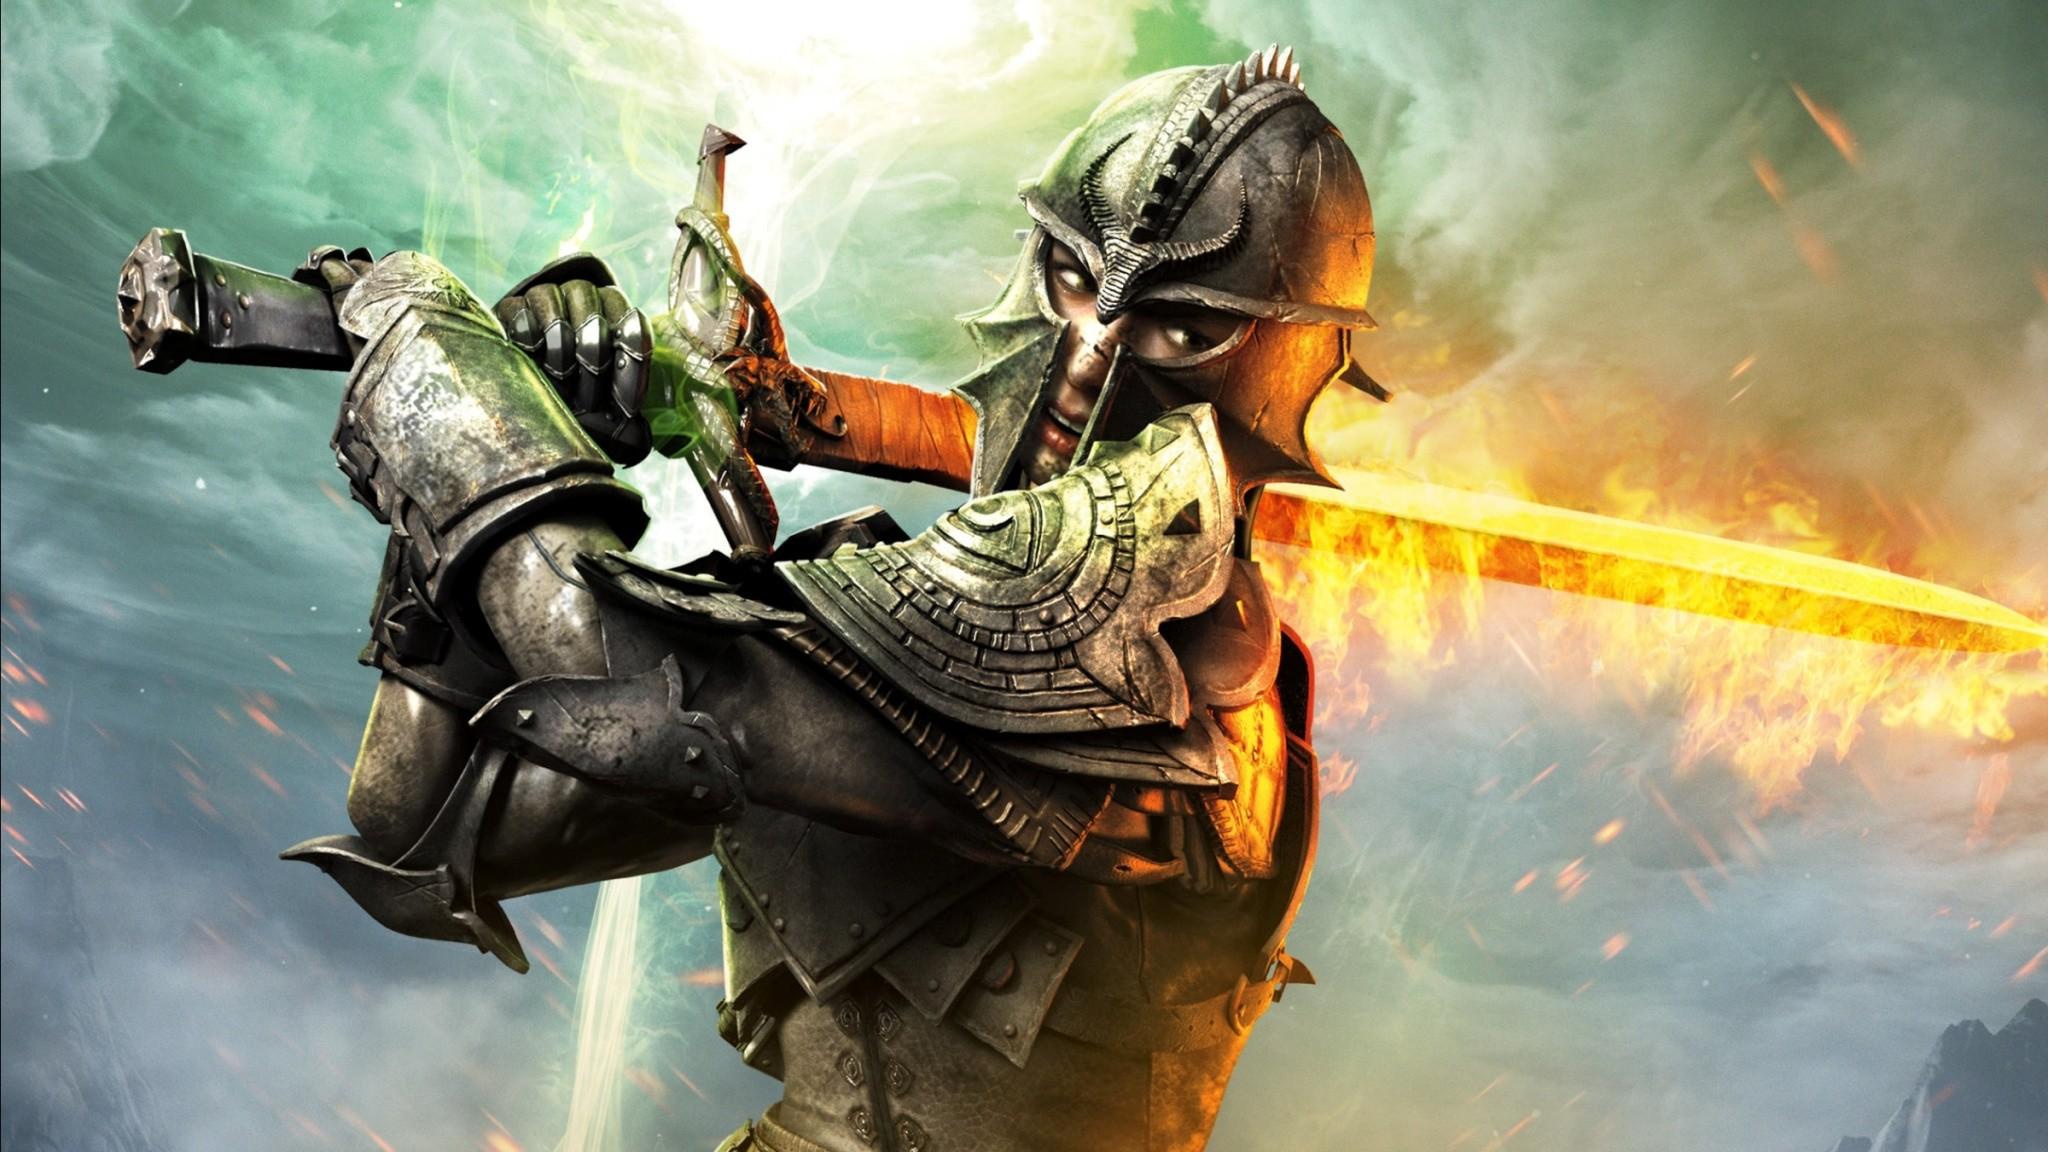 The Inquisitor Dragon Age: Inquisition